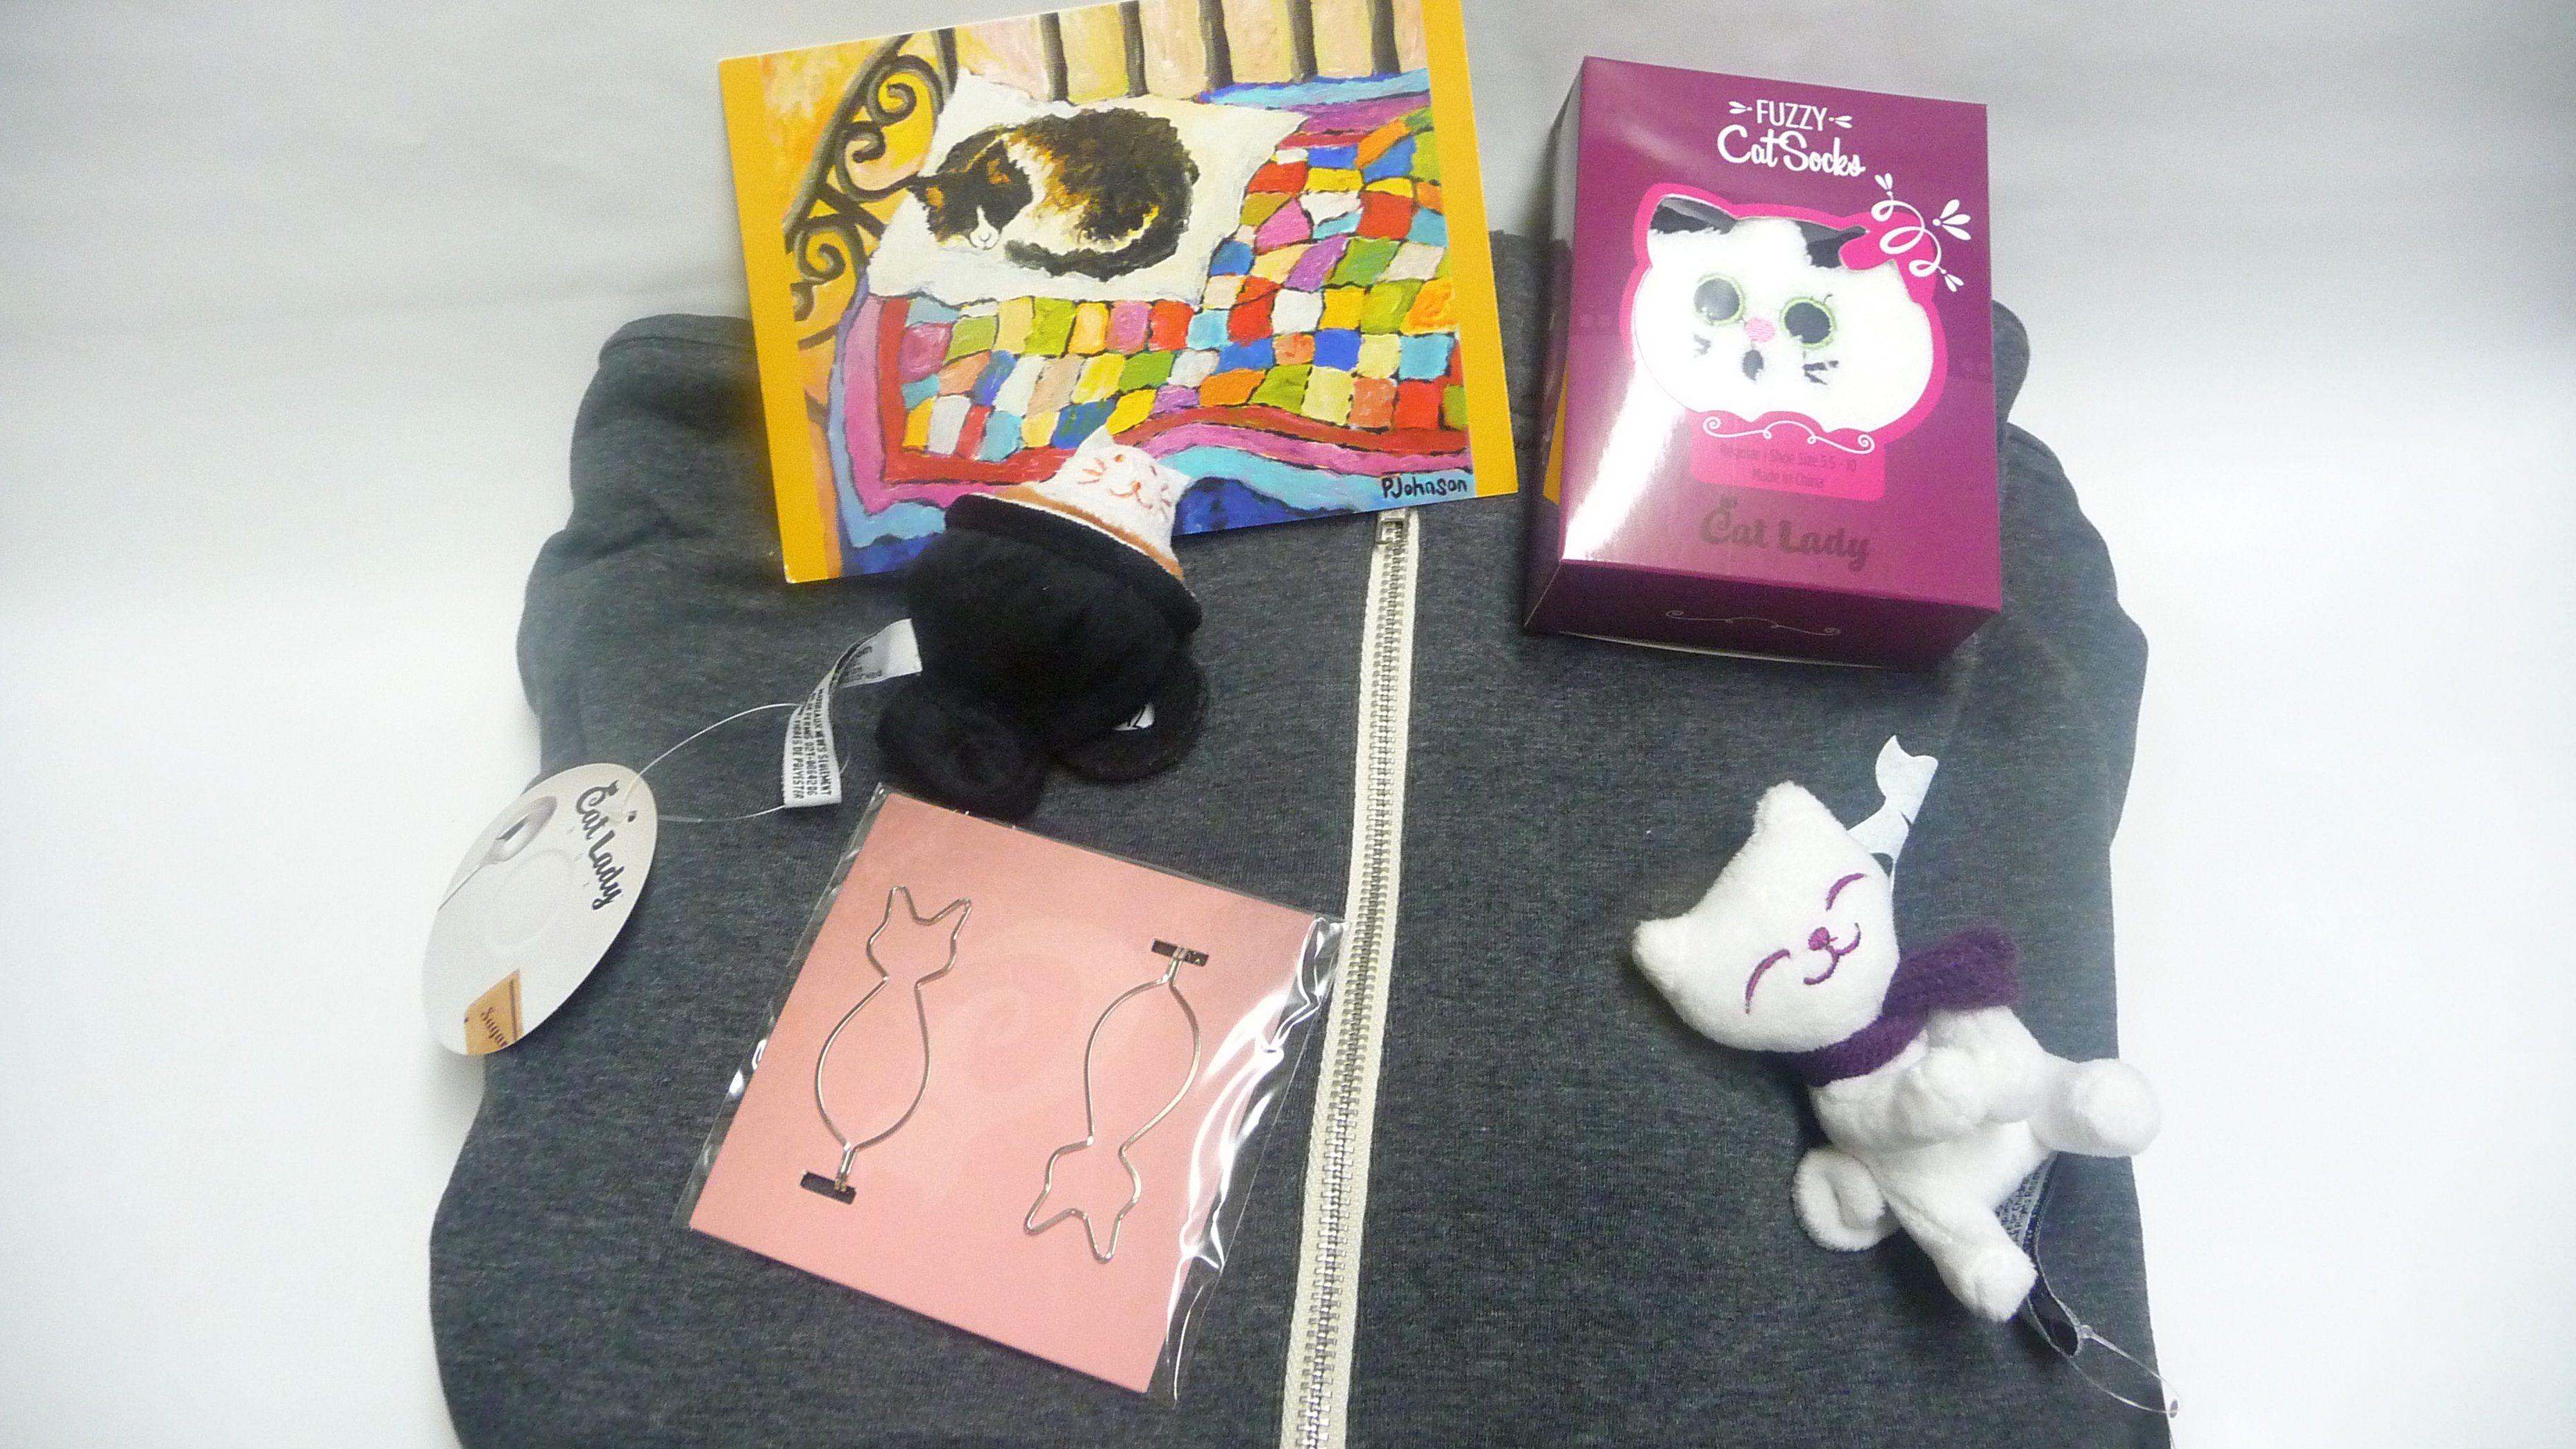 Cat Lady Box Subscription boxes, Cat lady, Box